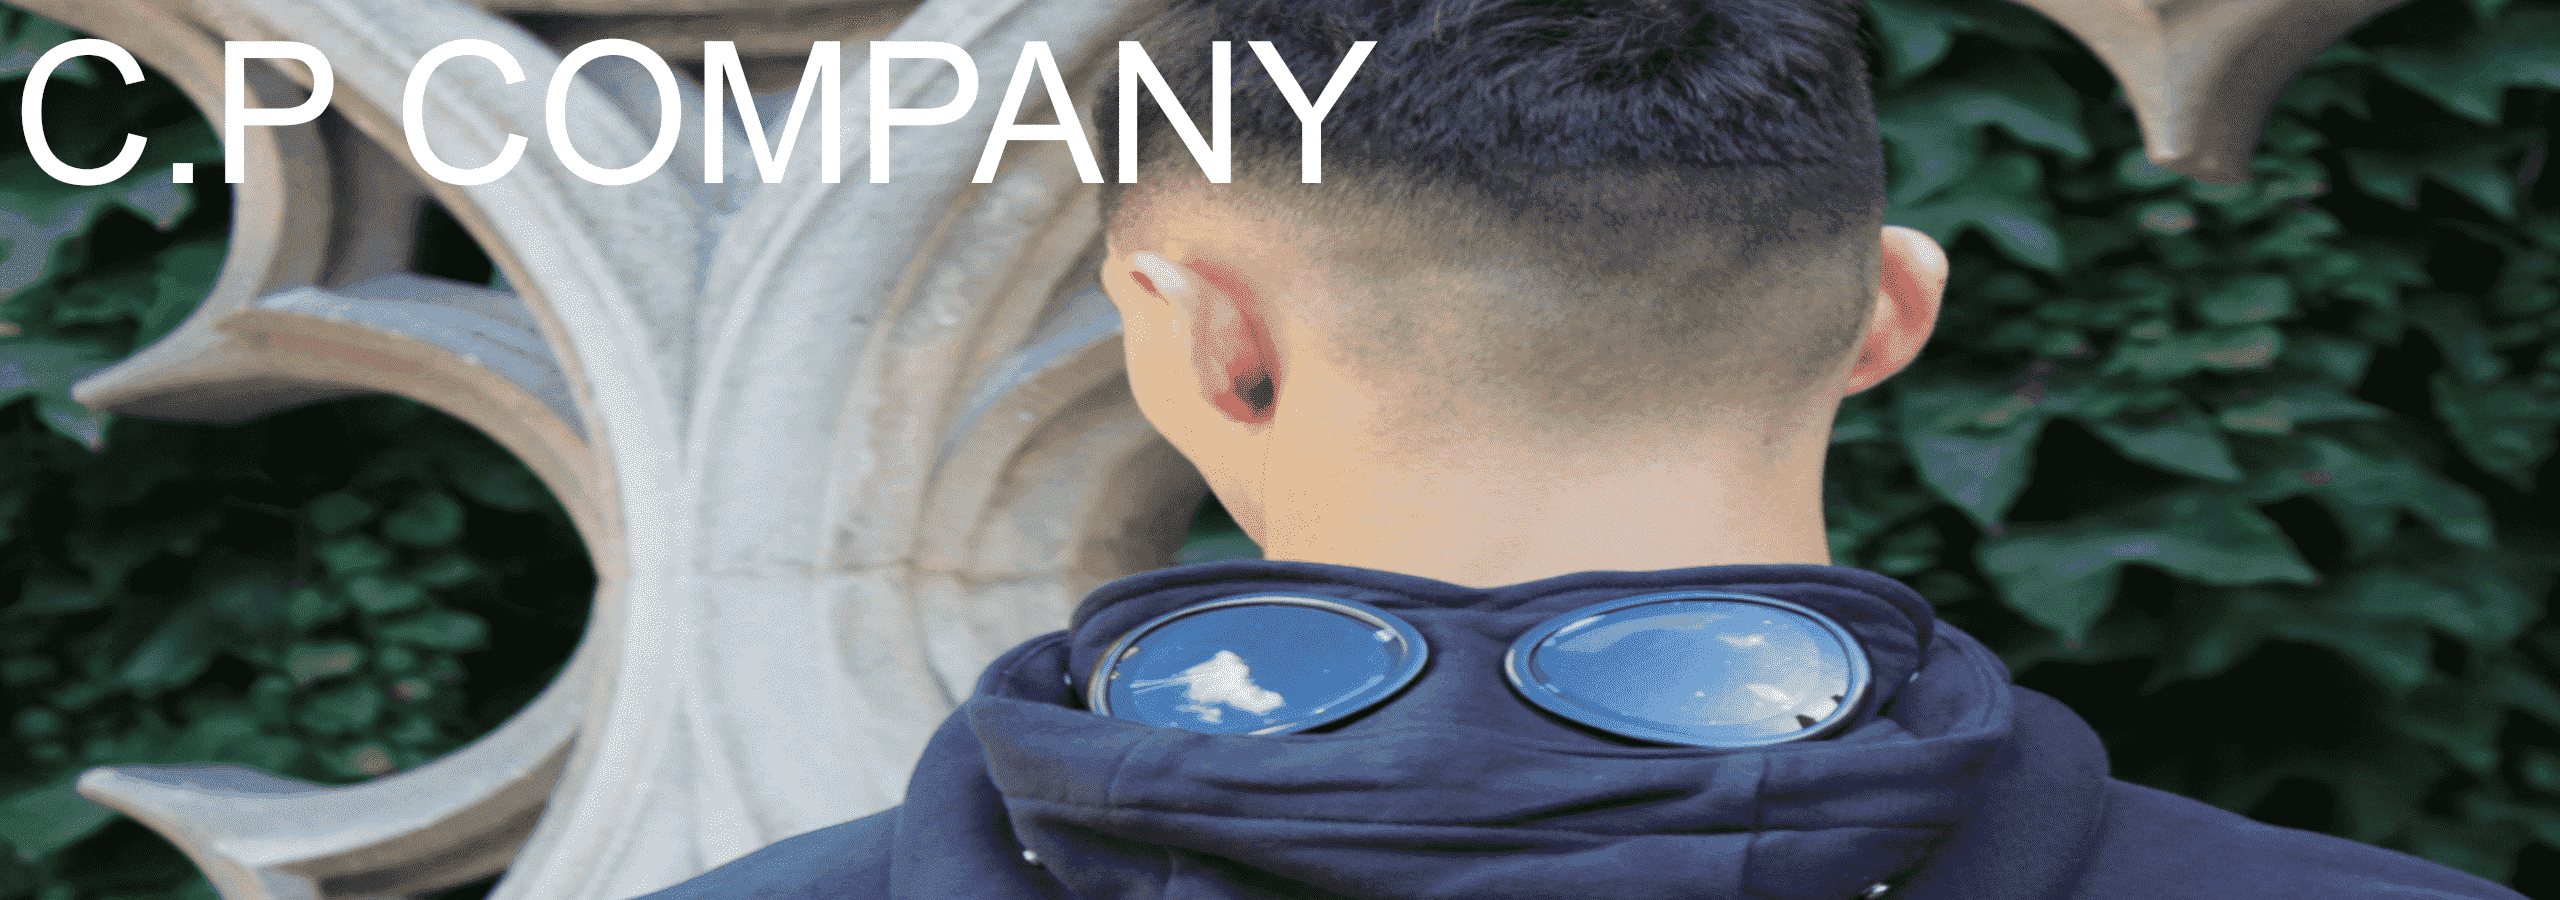 C.P COMPANY la marque italienne à l'iconique Goggle jacket